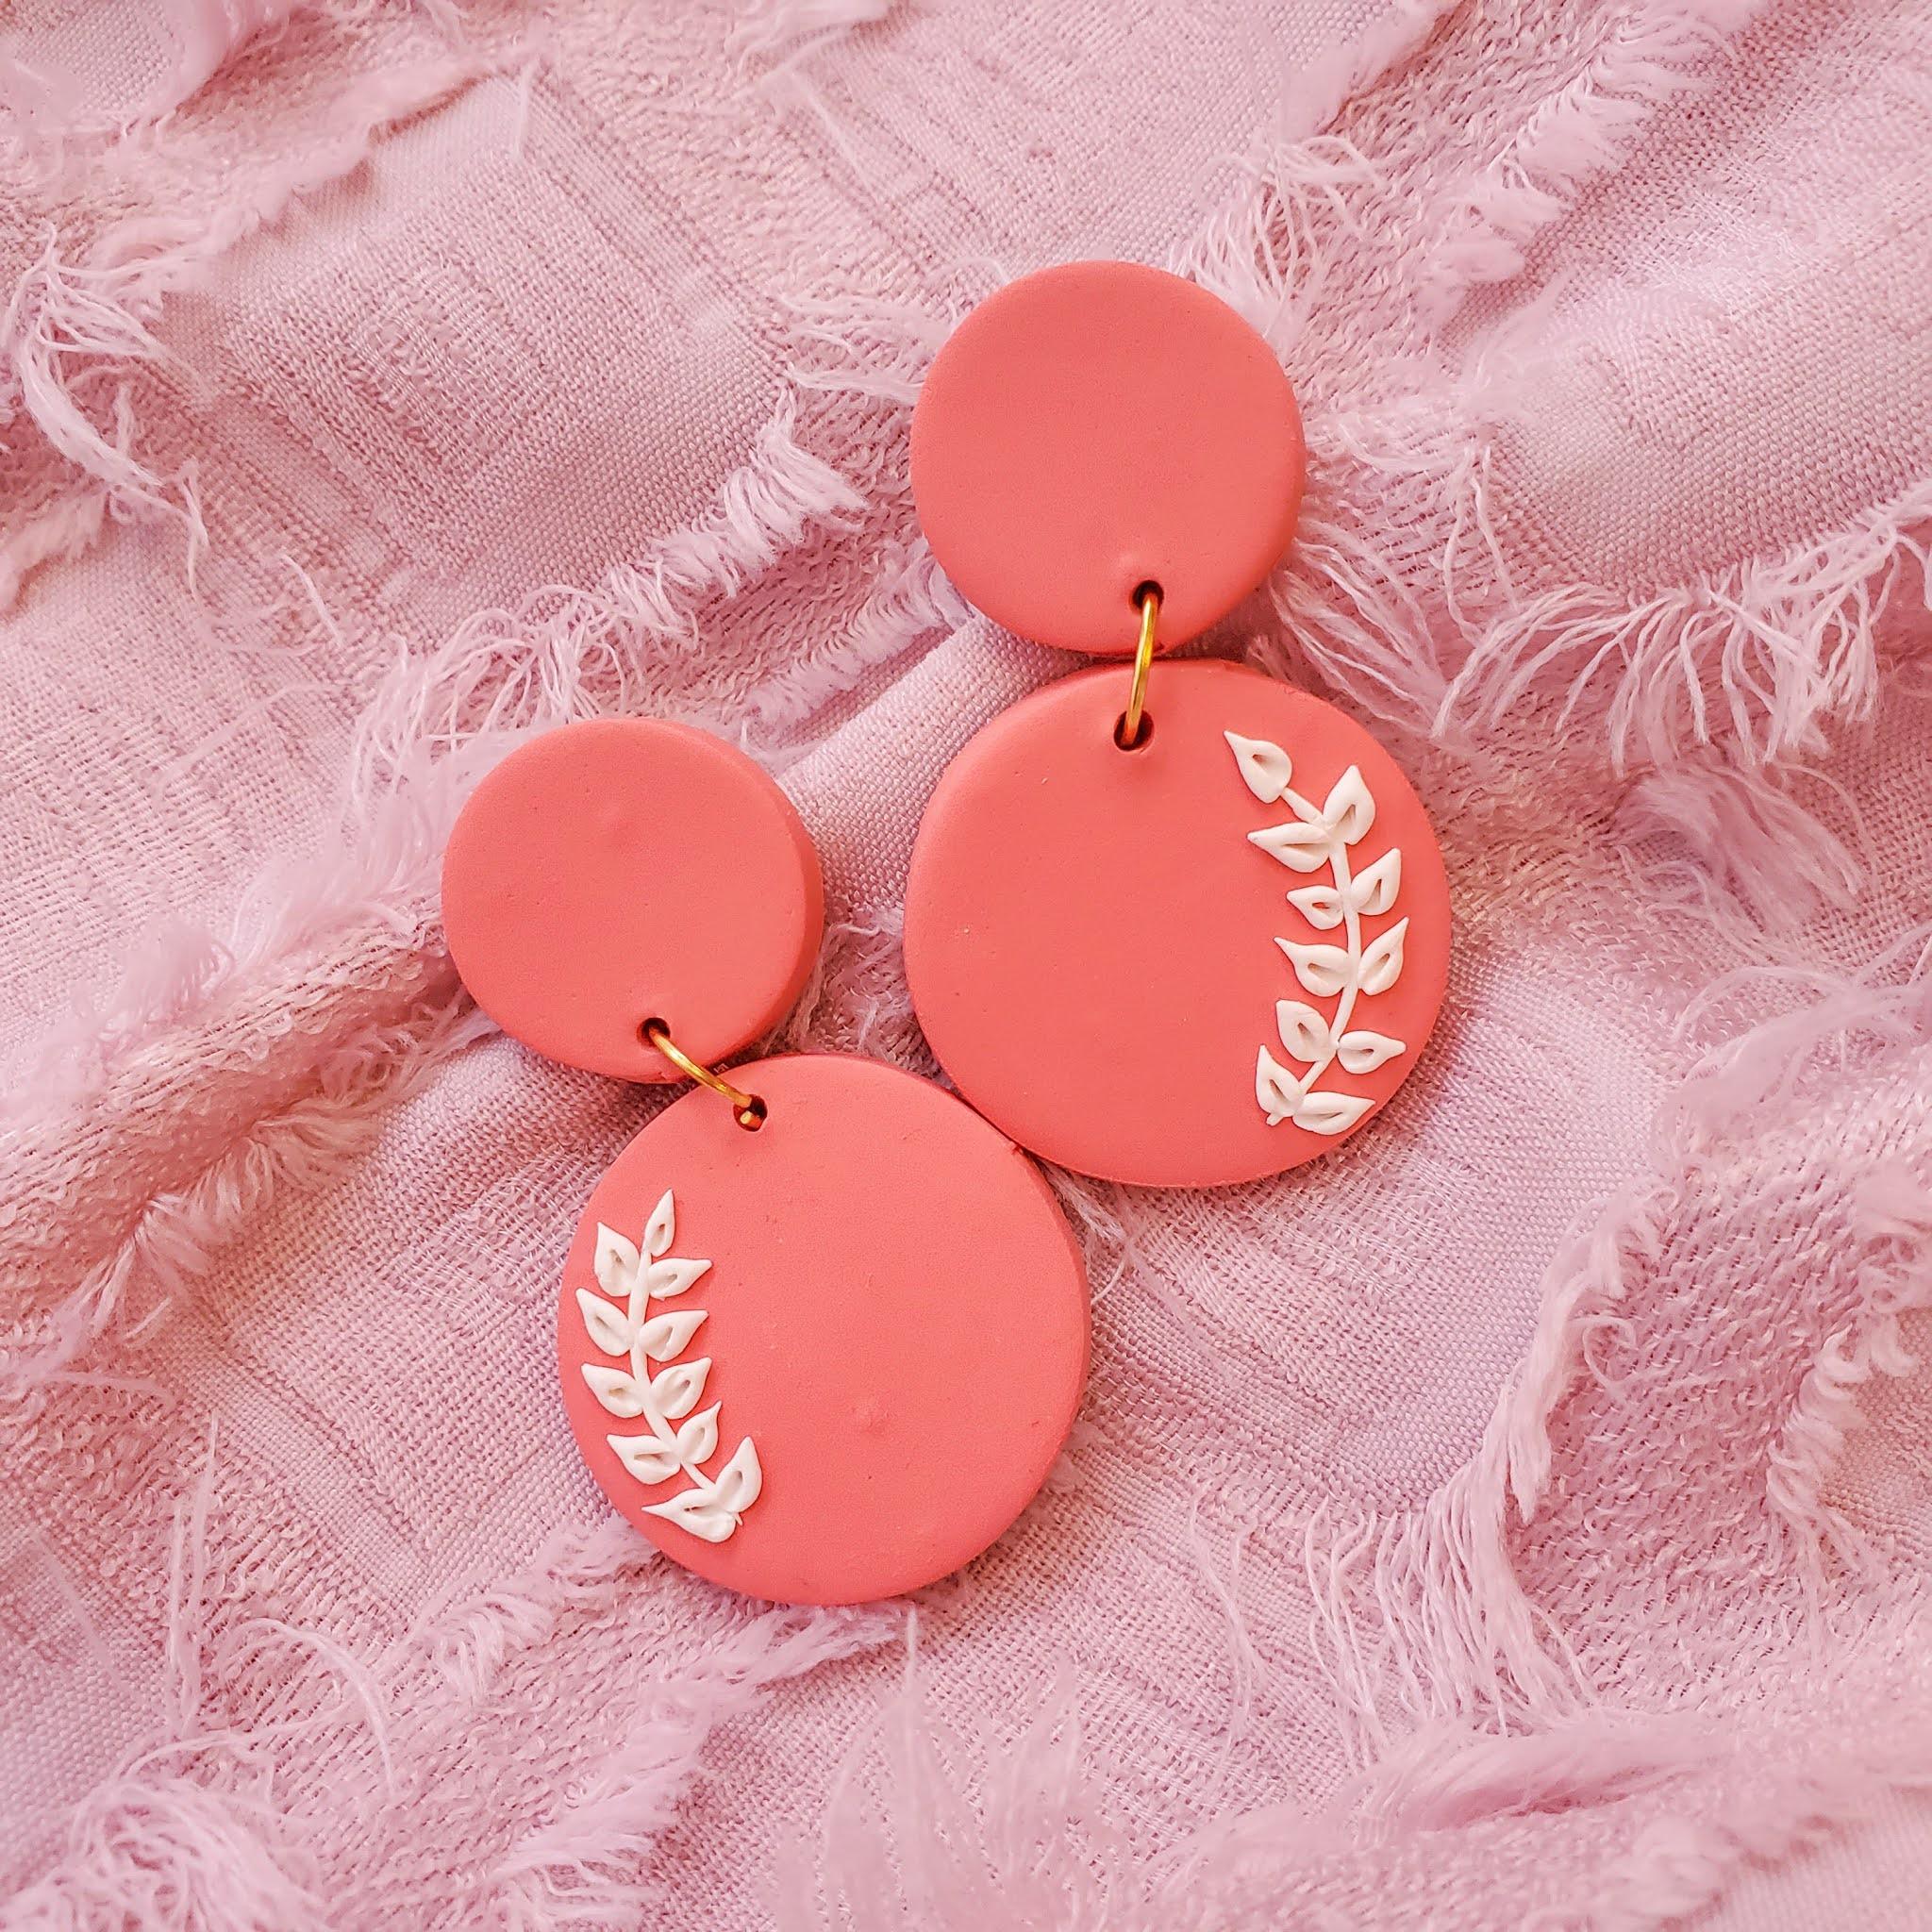 Handmade polymer clay statement earrings